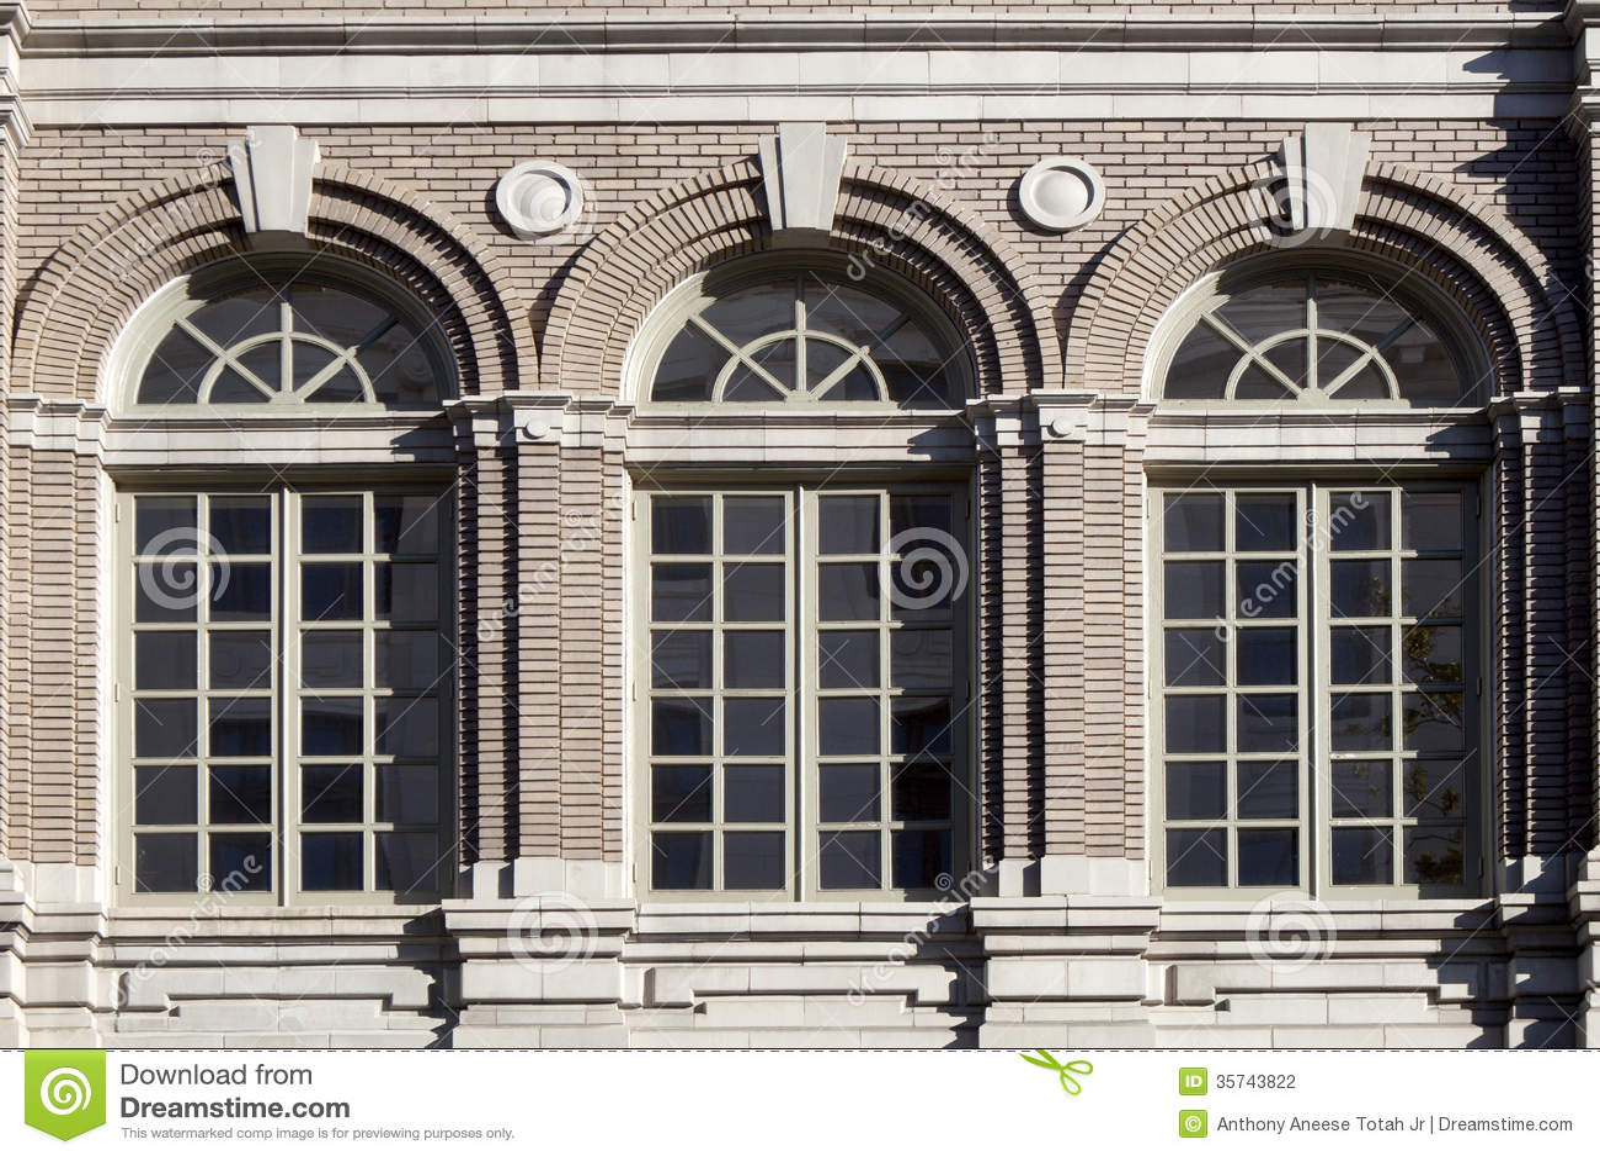 Architecture ornate window stock photo image 35743822 for Architecture windows